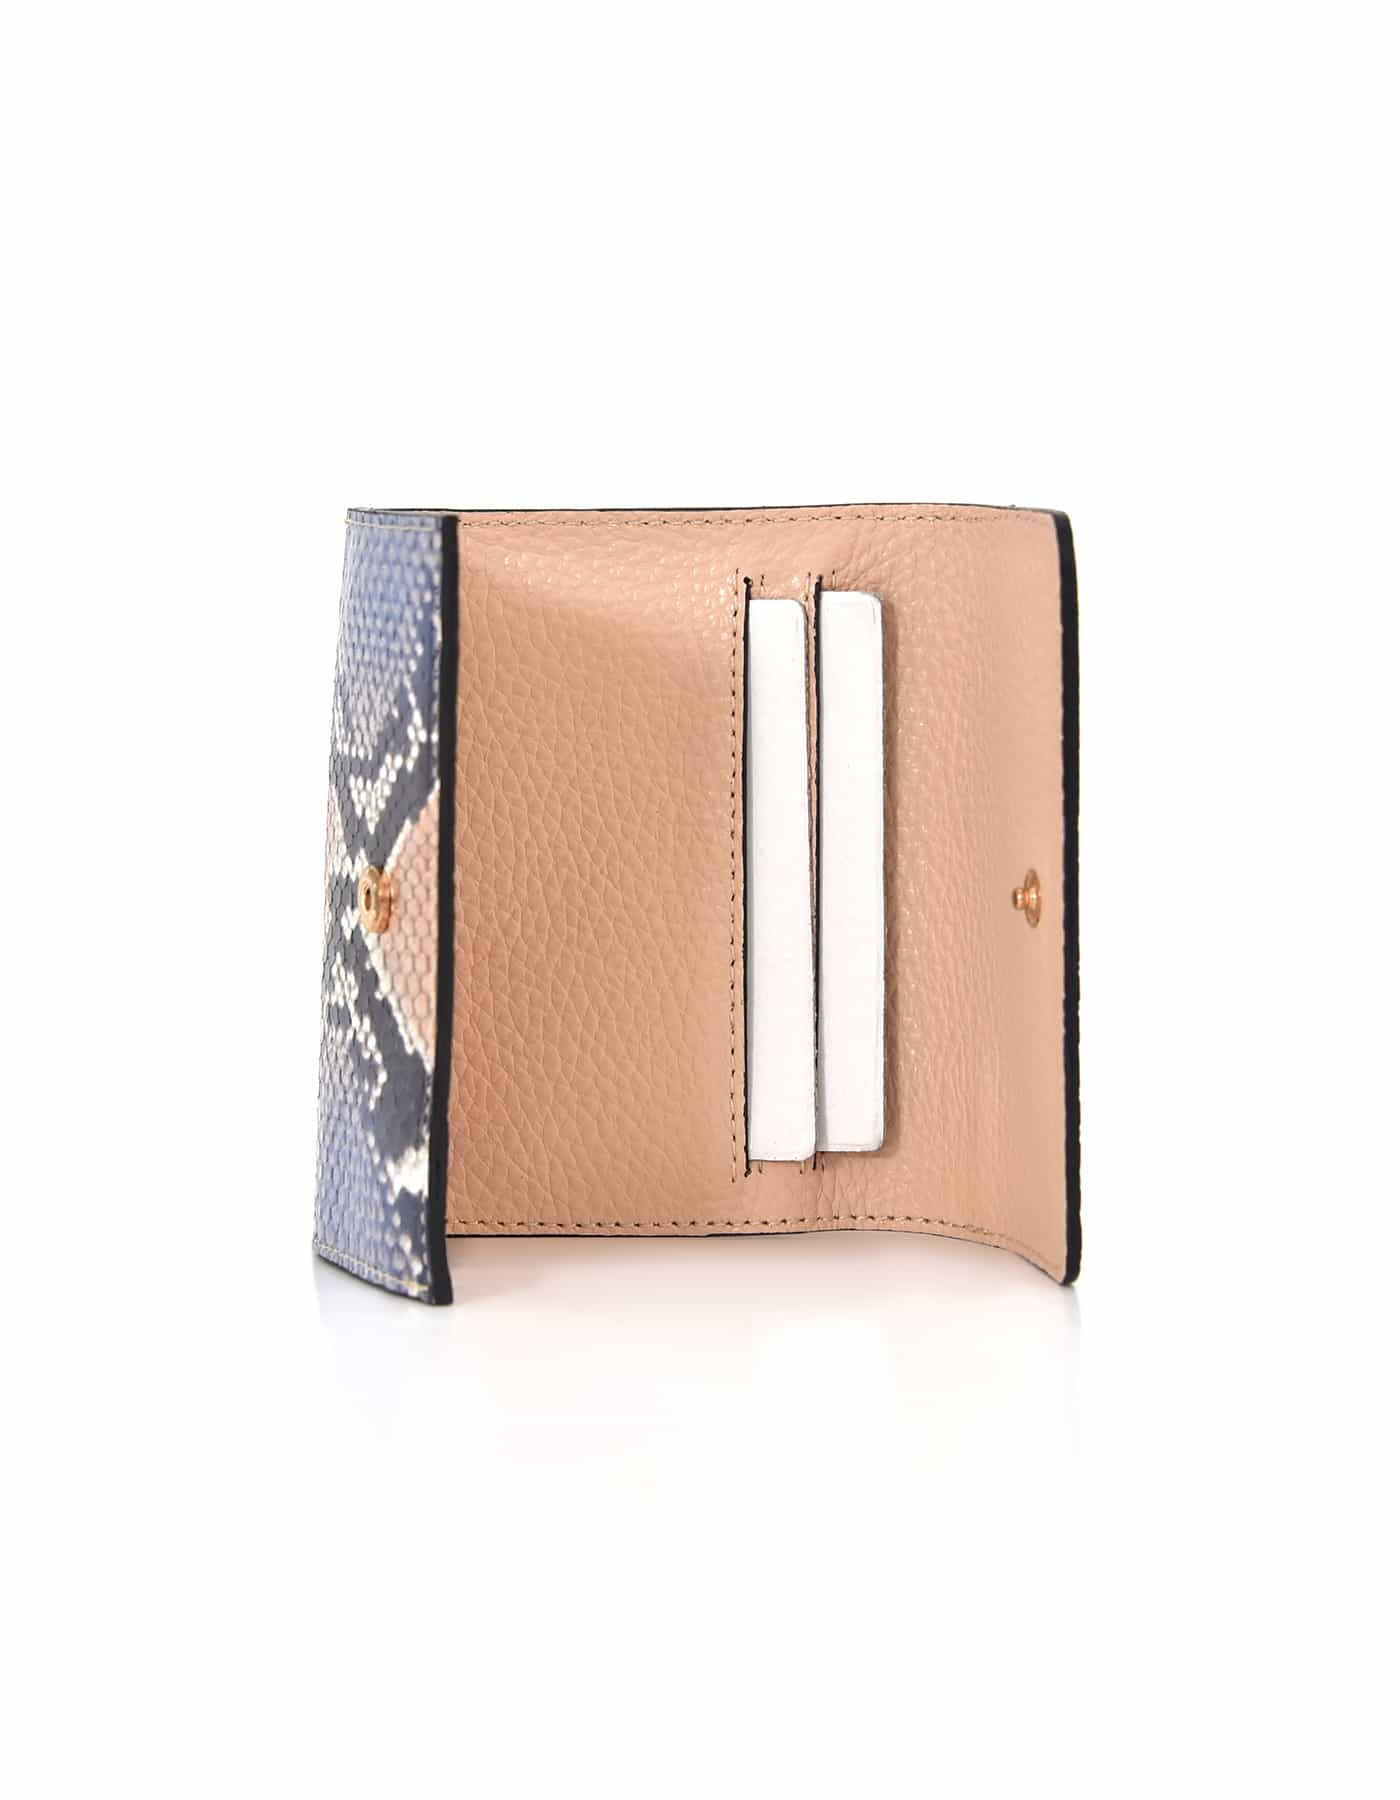 Wallet Python Leather - Beige & Blue